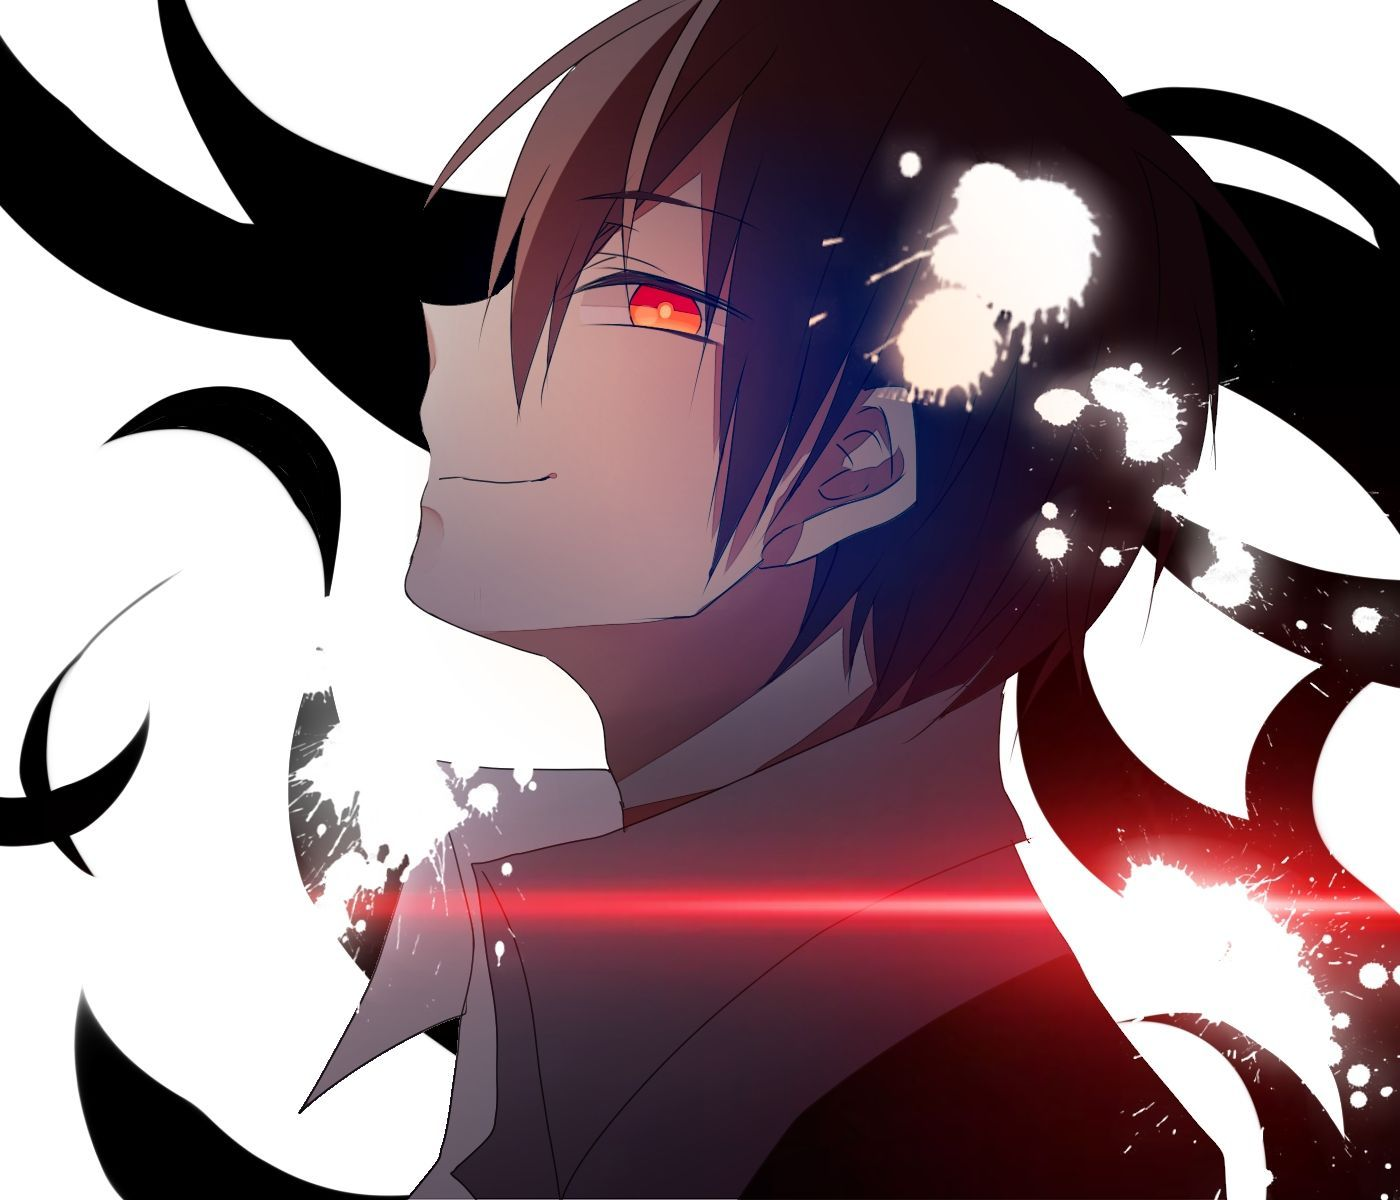 76 Assassination Classroom Wallpaper Hd In 2020 Assassination Classroom Anime Karma Akabane